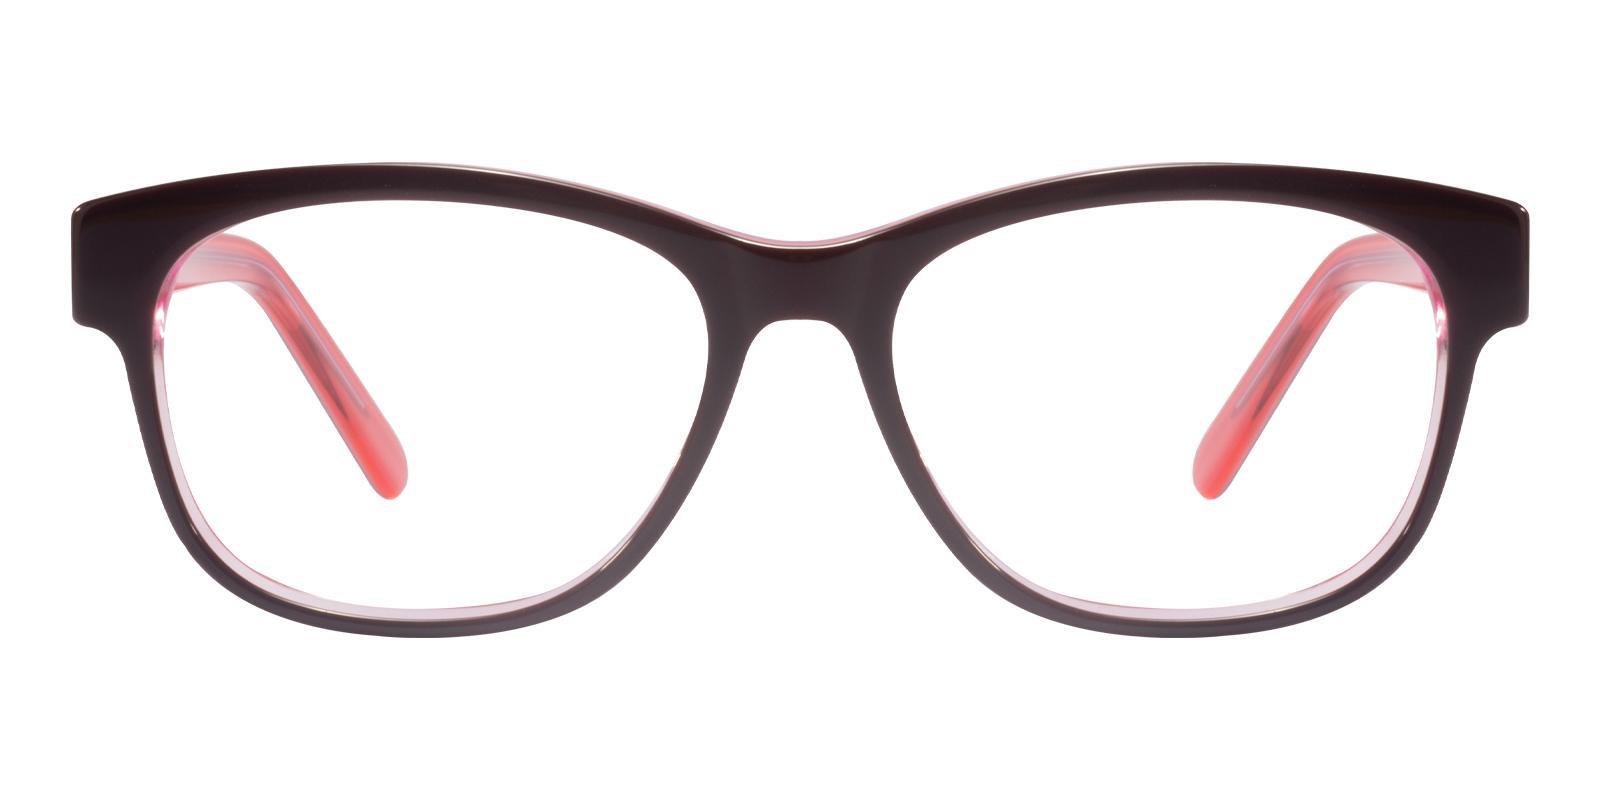 Doubell Red Acetate Eyeglasses , UniversalBridgeFit Frames from ABBE Glasses